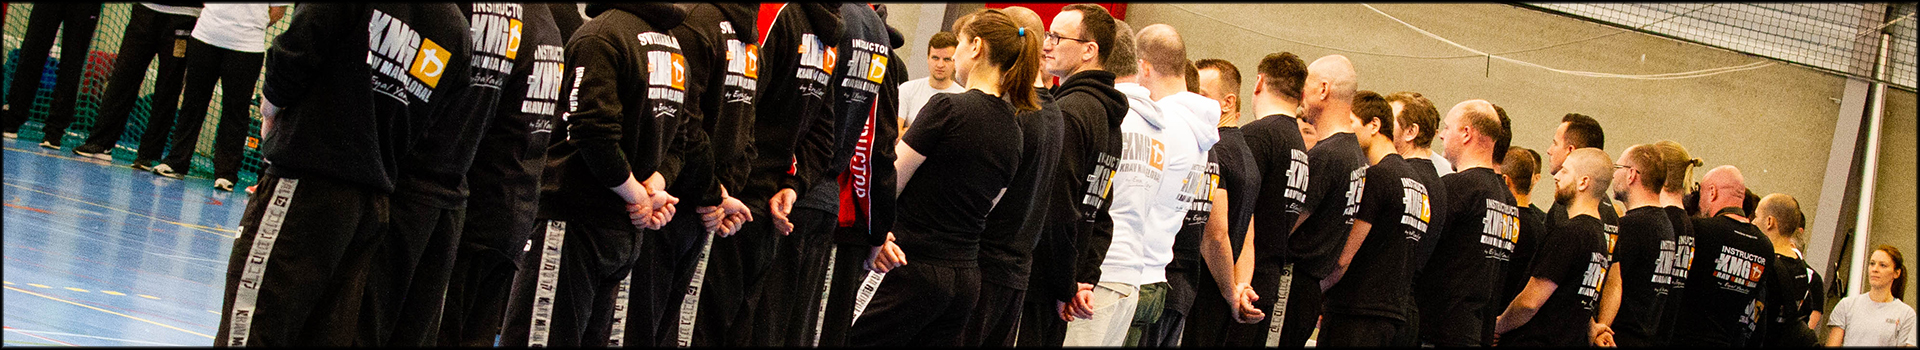 Les instructeurs de Krav Maga Global Belgique